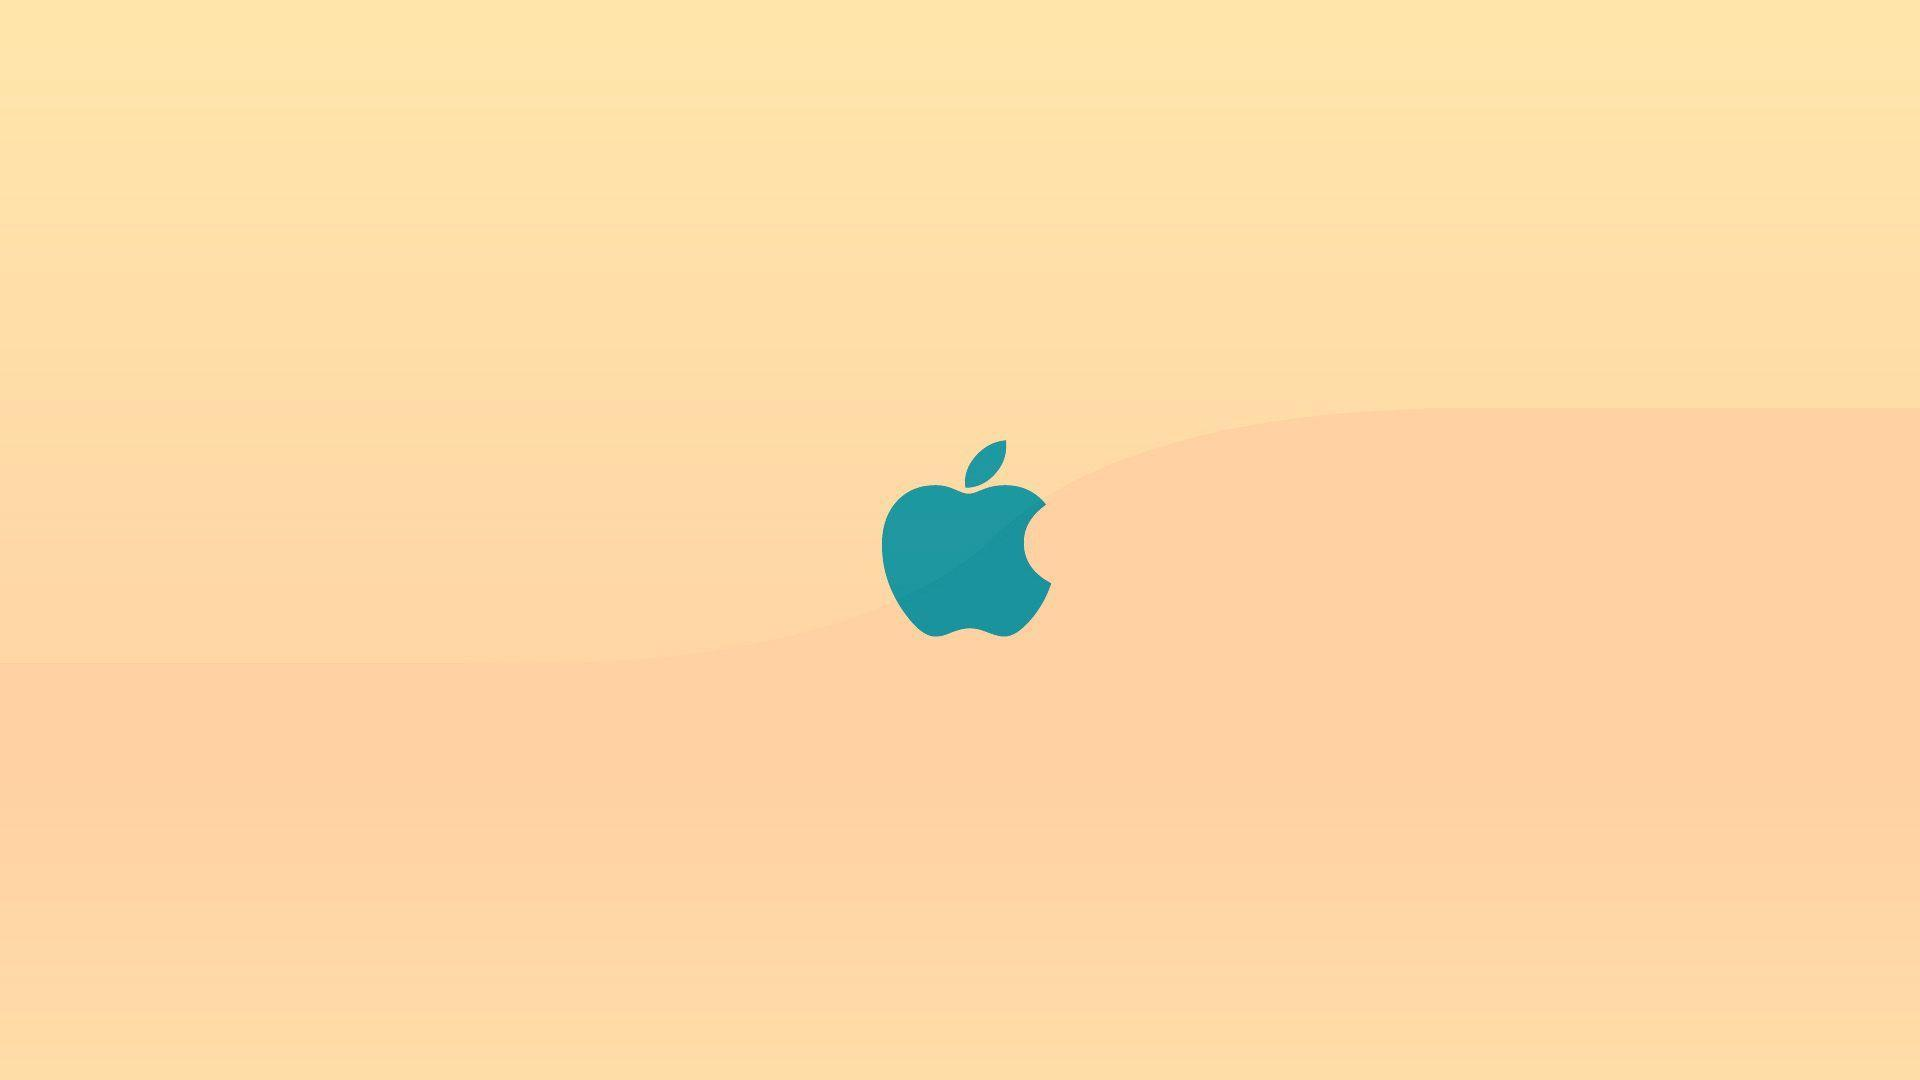 Retro mac wallpapers wallpaper cave for Sfondo apple hd